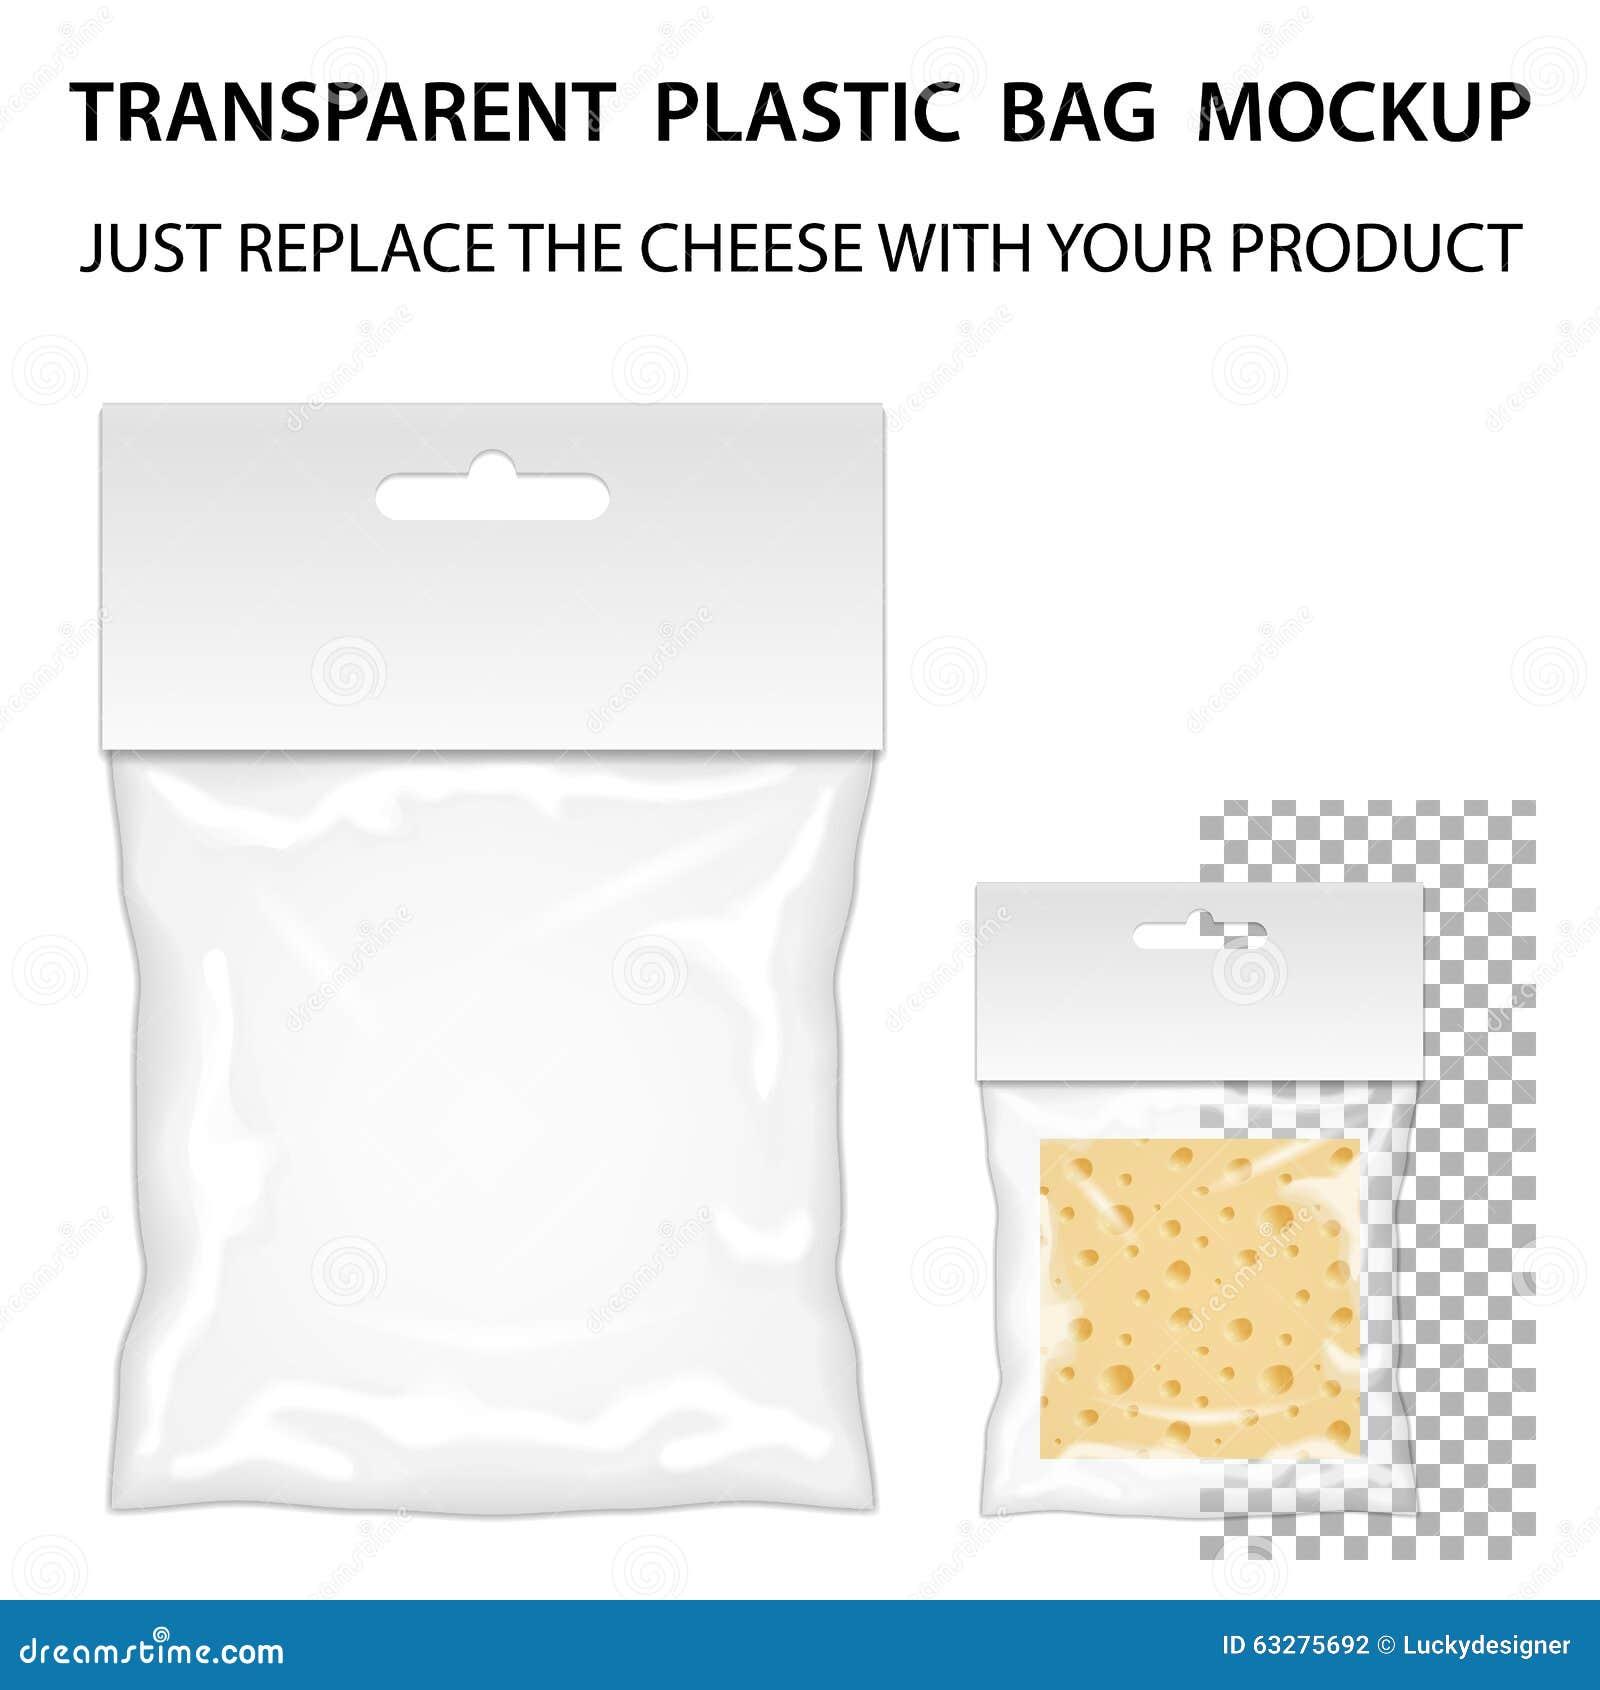 7ce47125d8c94 Transparent Plastic Bag Mockup Ready For Your Design. Blank Pack ...